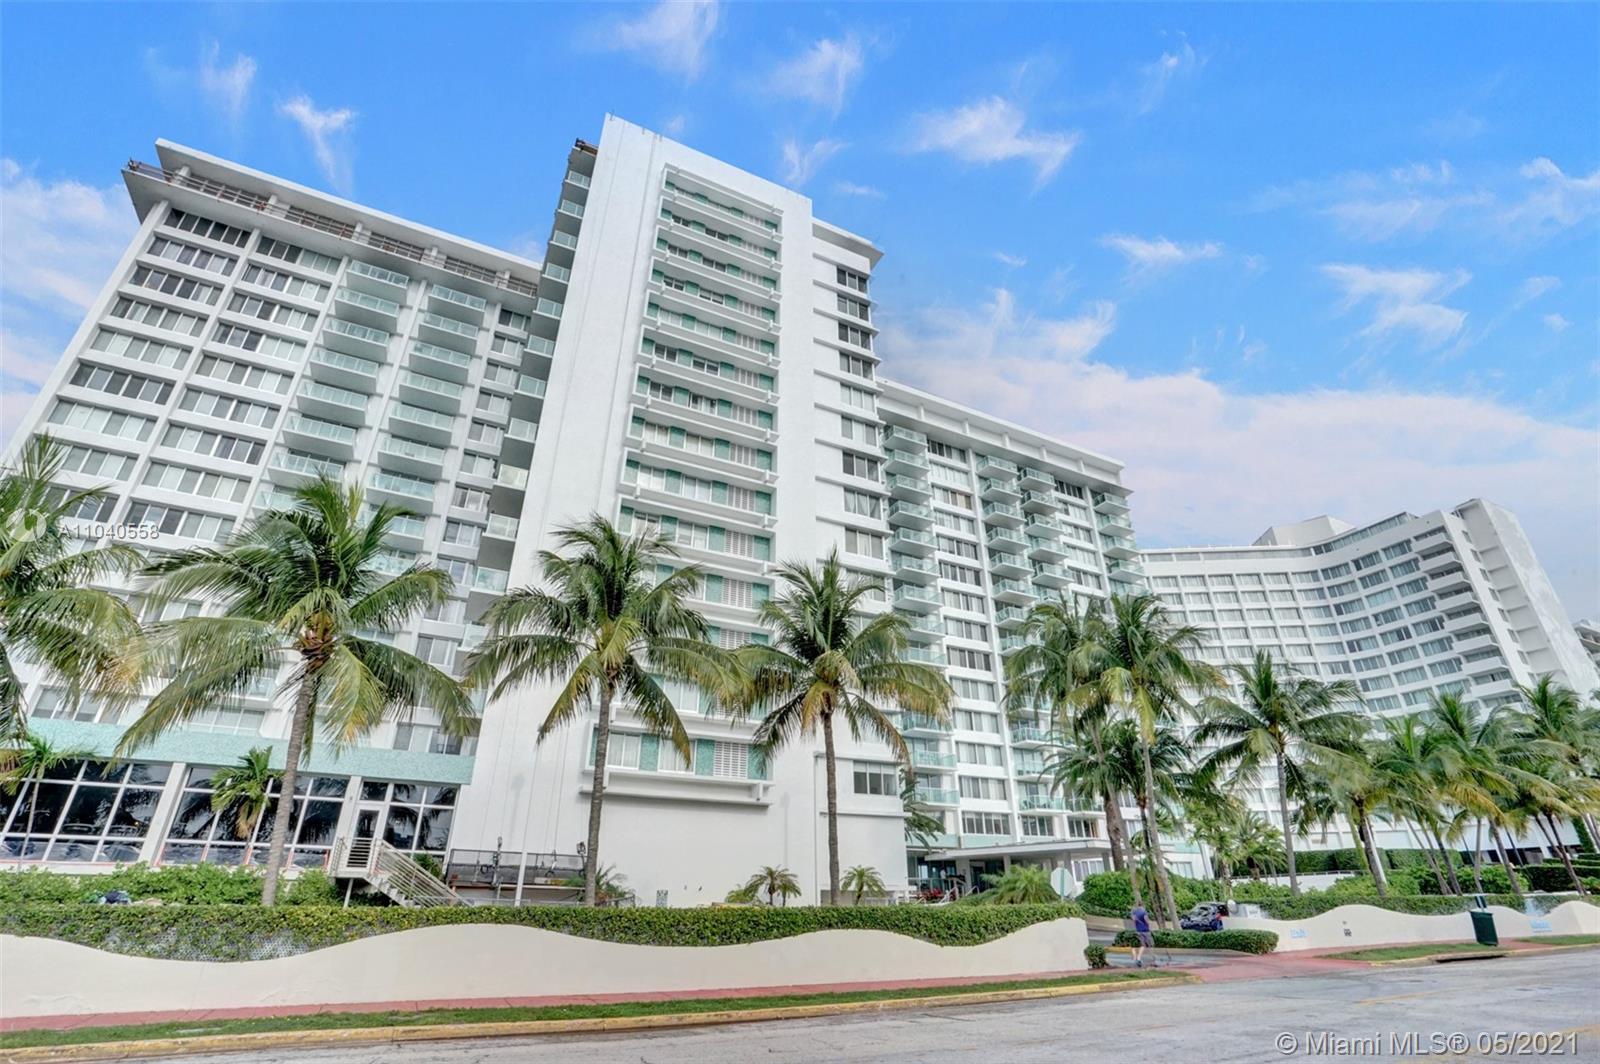 Mirador South #706 - 1000 West Ave #706, Miami Beach, FL 33139